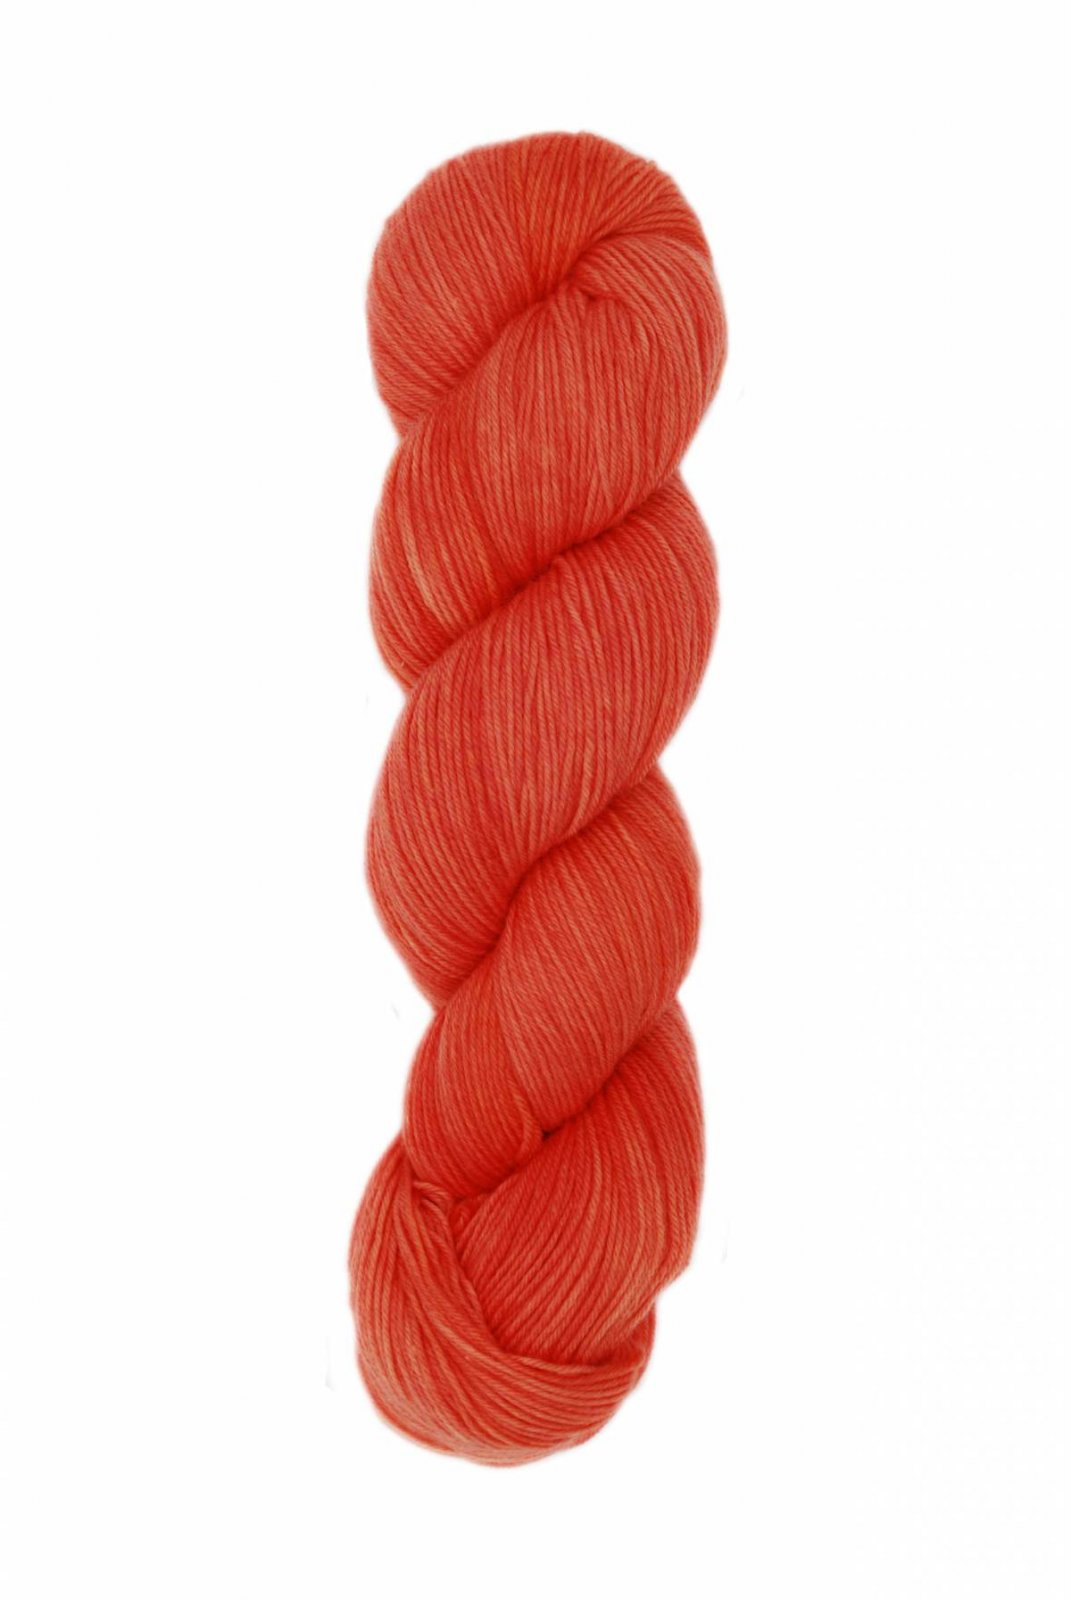 KFI Collection:  Indulgence Kettle Dyed:  1007 Pumpkin